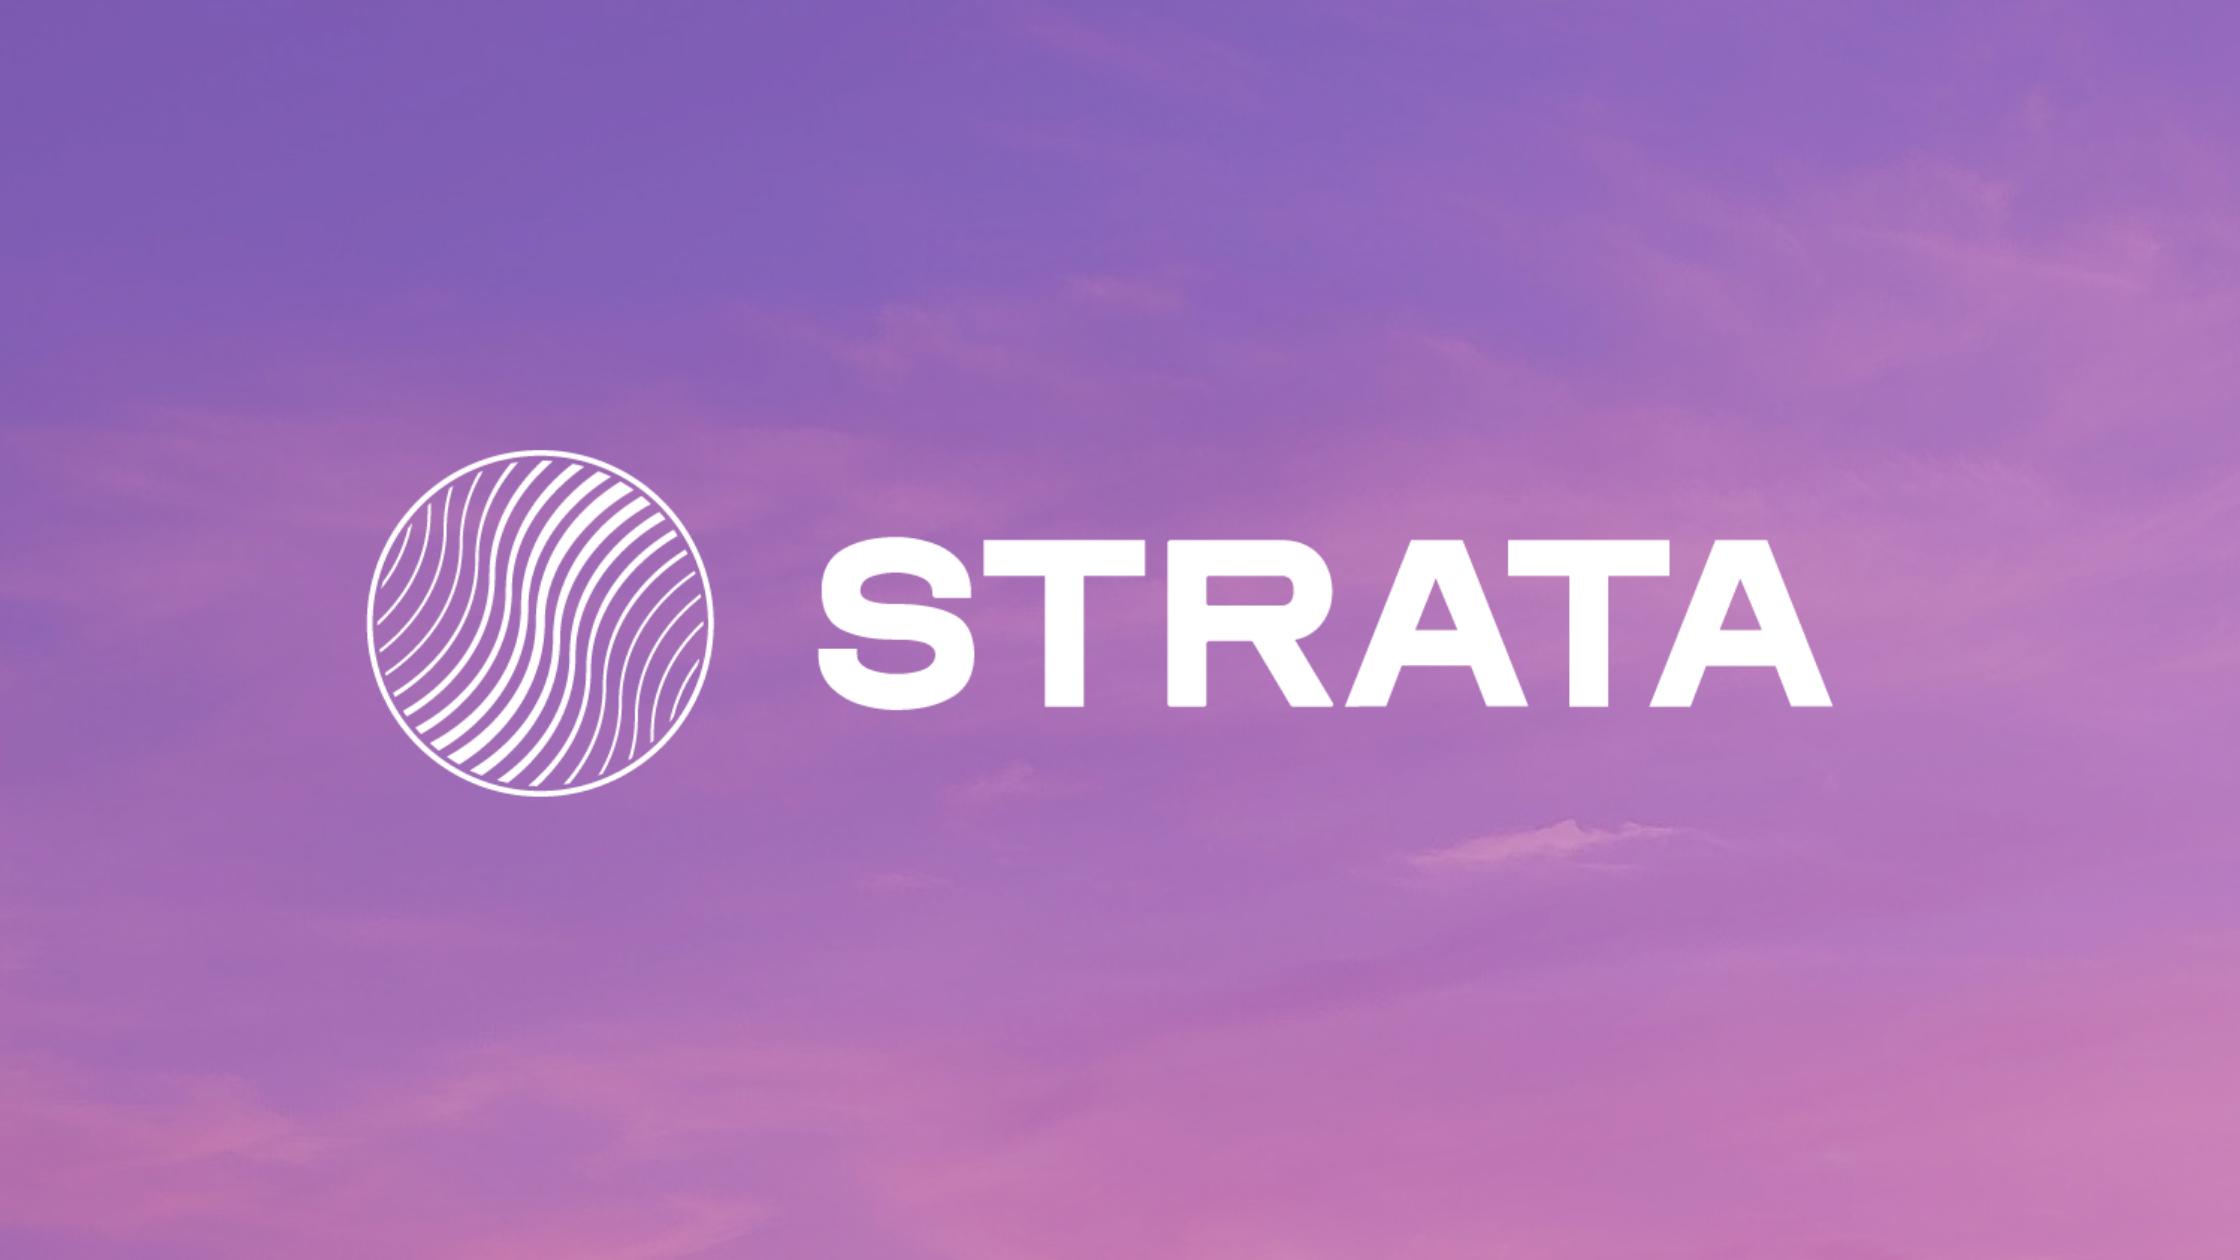 Strata Identity Logo on Purple Skies background